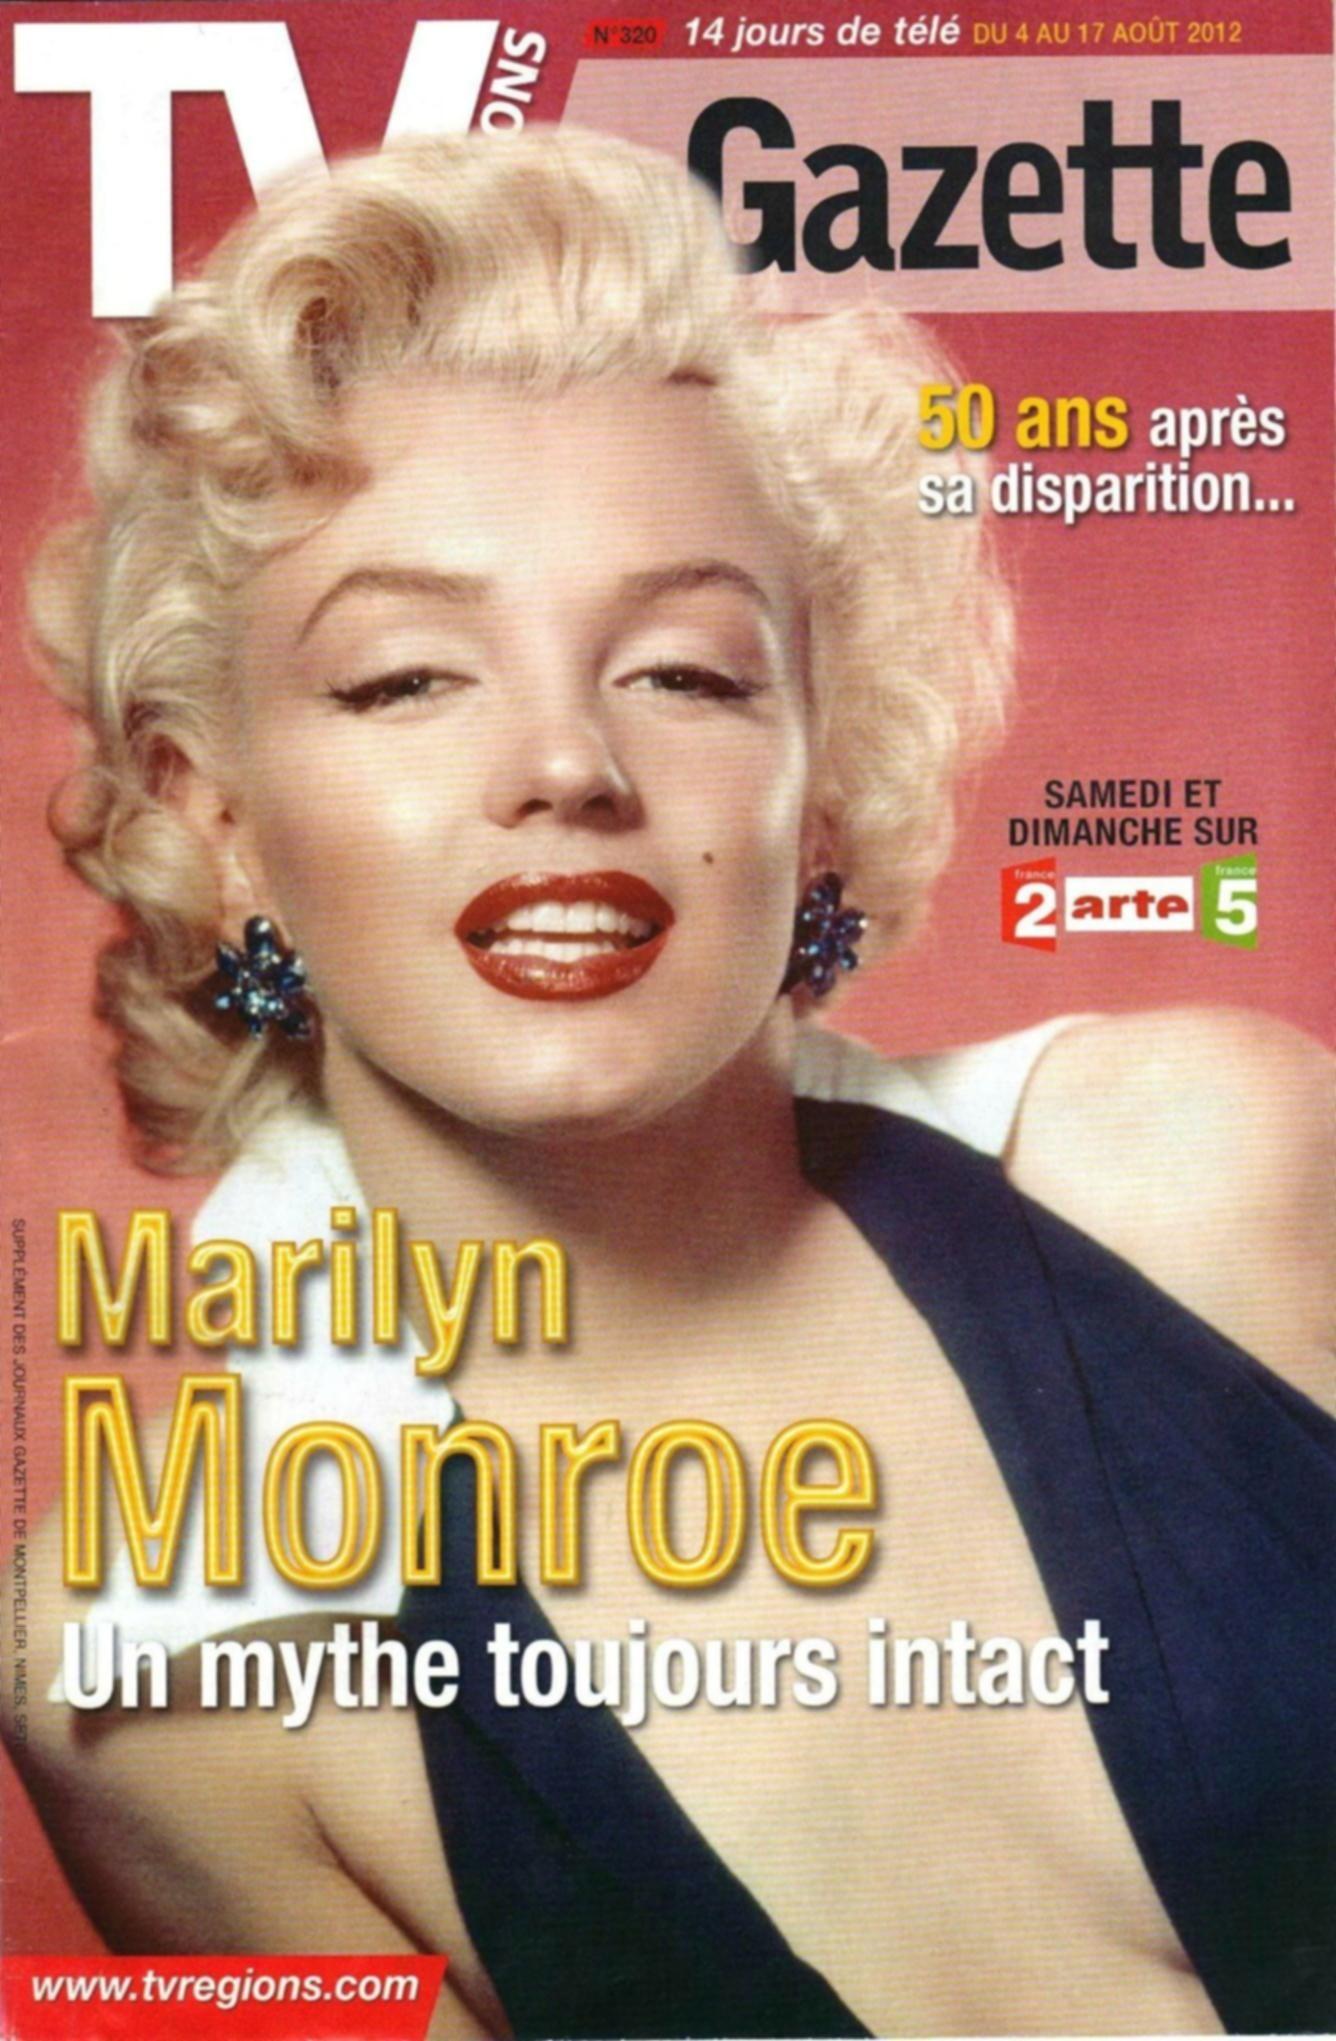 2012-08-04-tv_regions_gazette-france